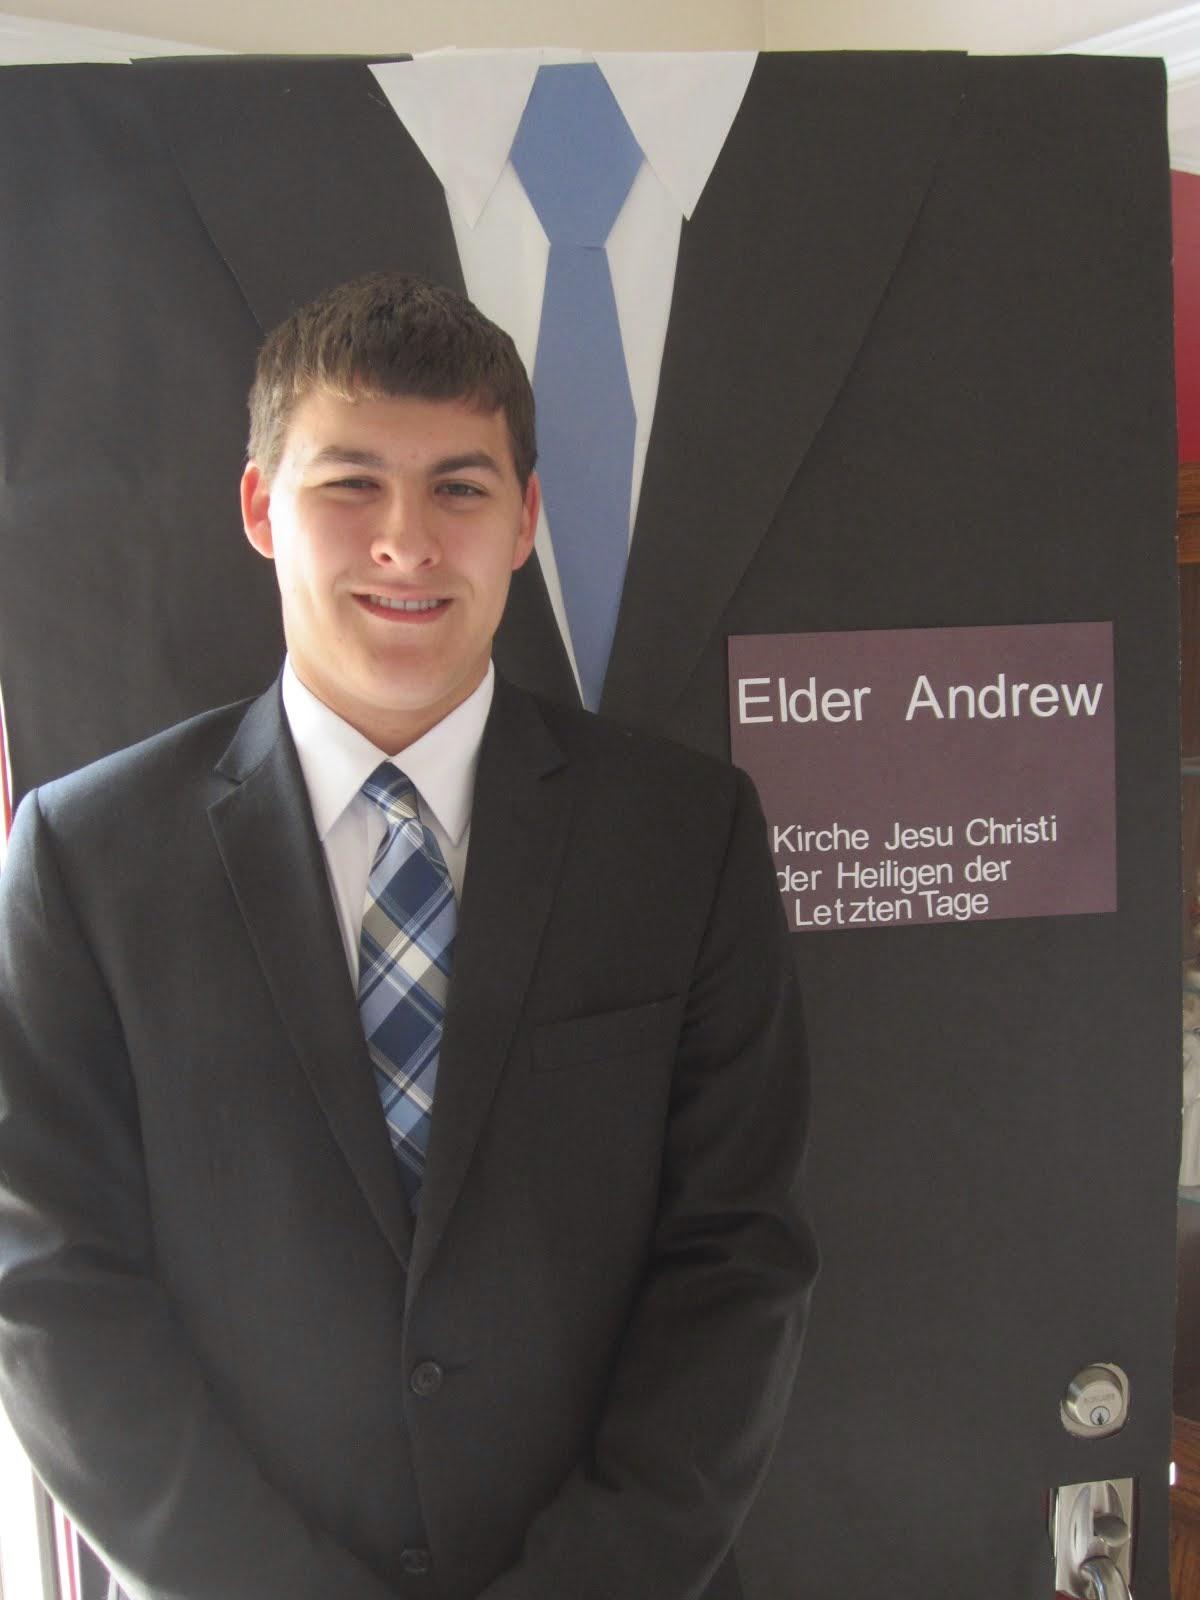 Elder Andrew